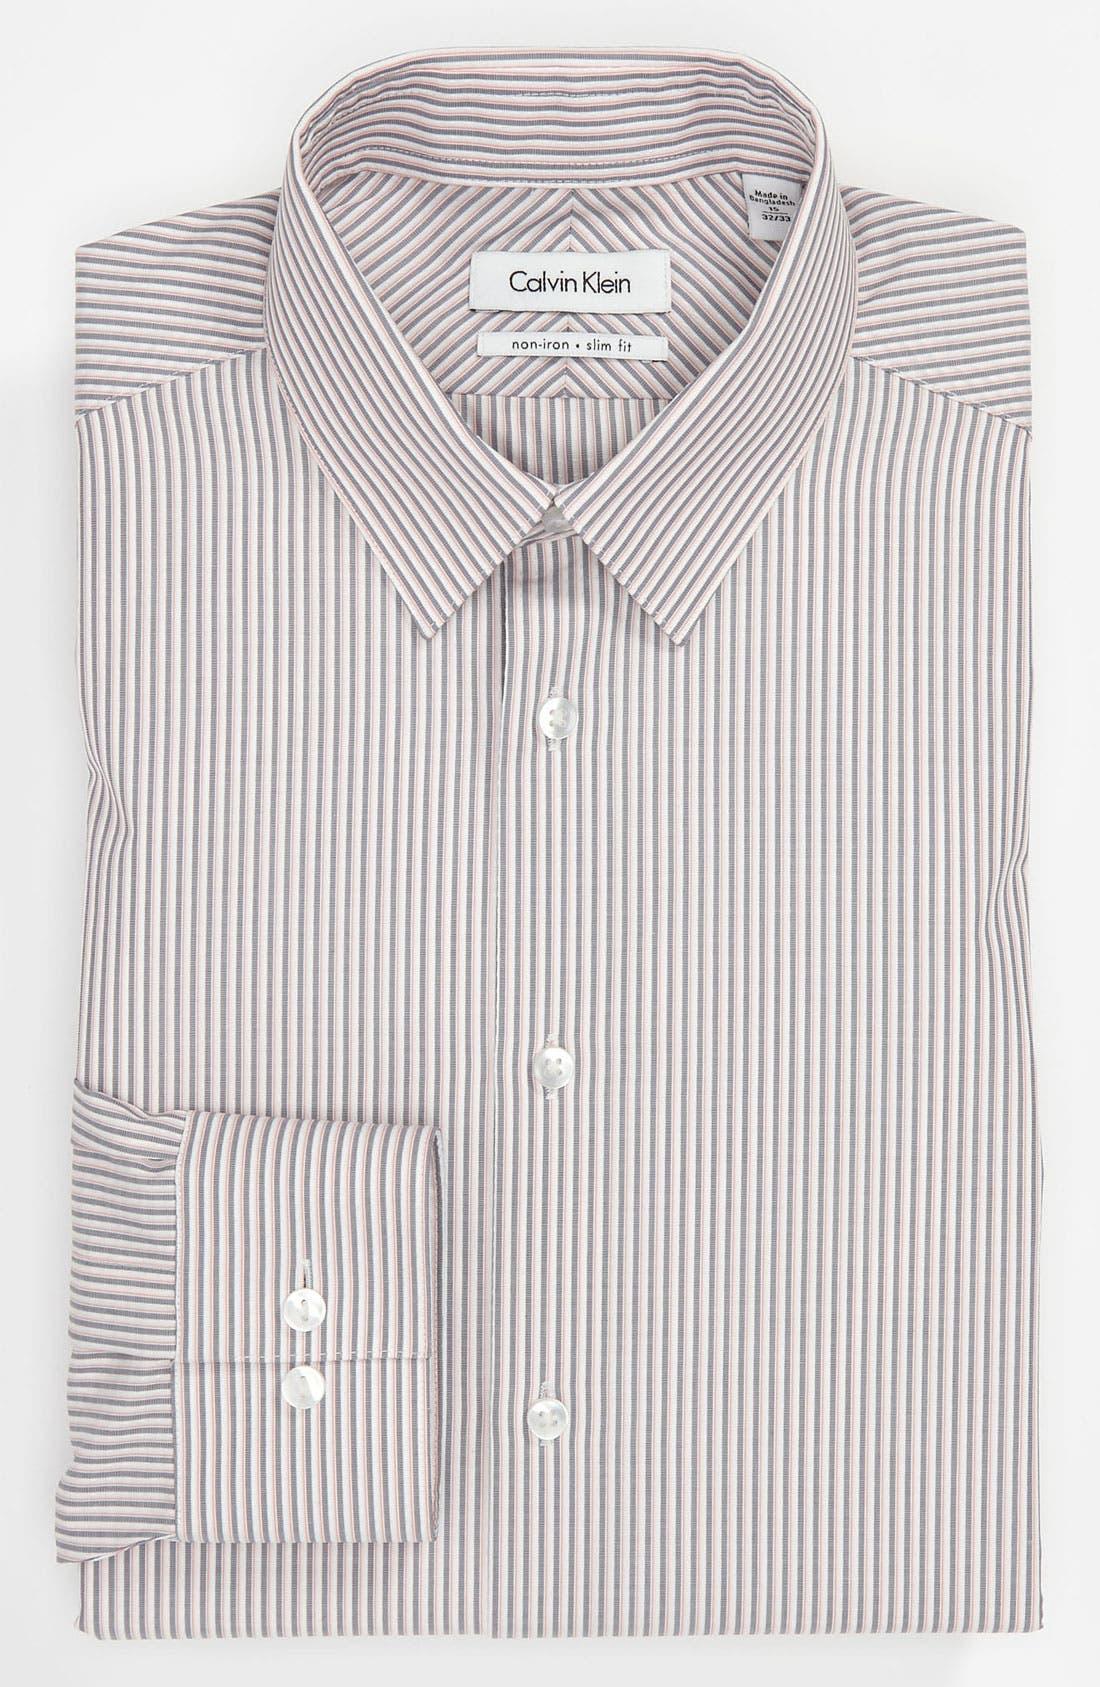 Main Image - Calvin Klein 'South Beach Stripe' Slim Fit Dress Shirt